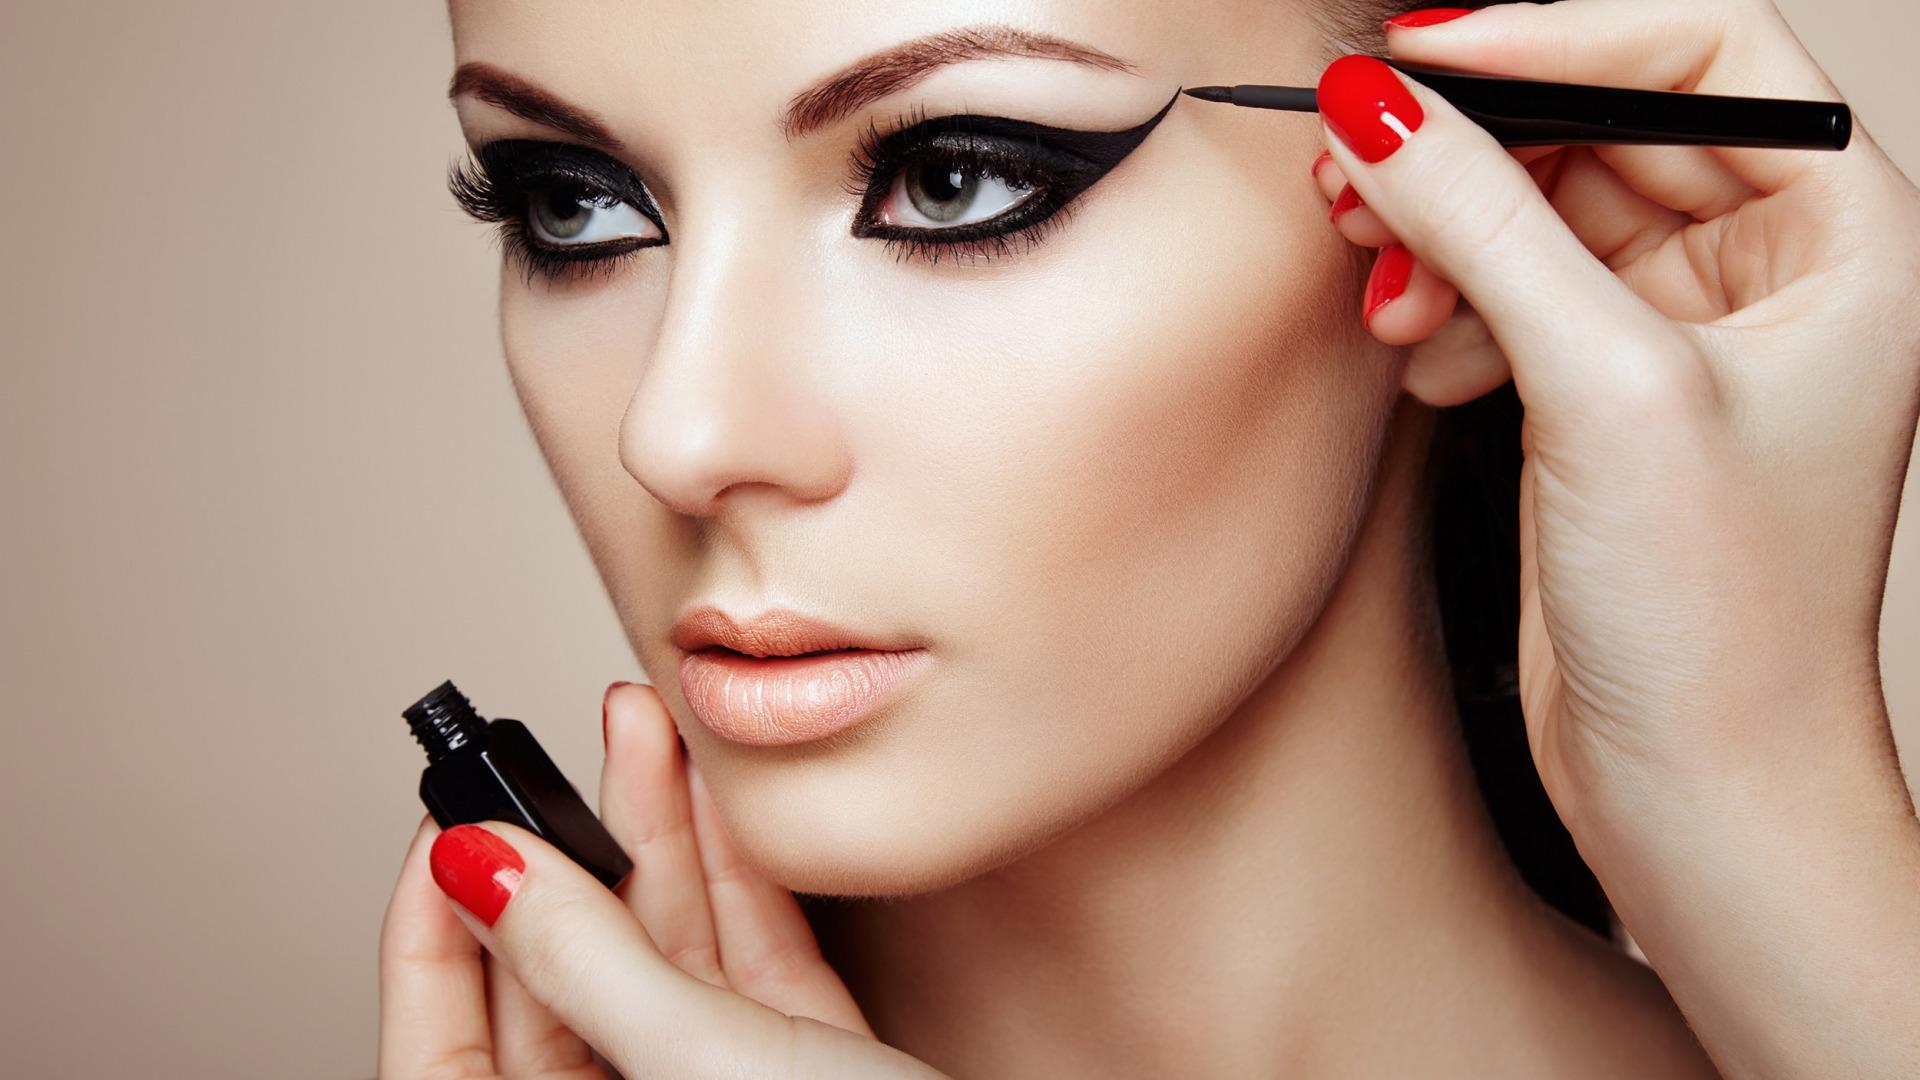 Beauty studio photo editor free download Beauty Studio - Photo Editor APK Download - Free. - m